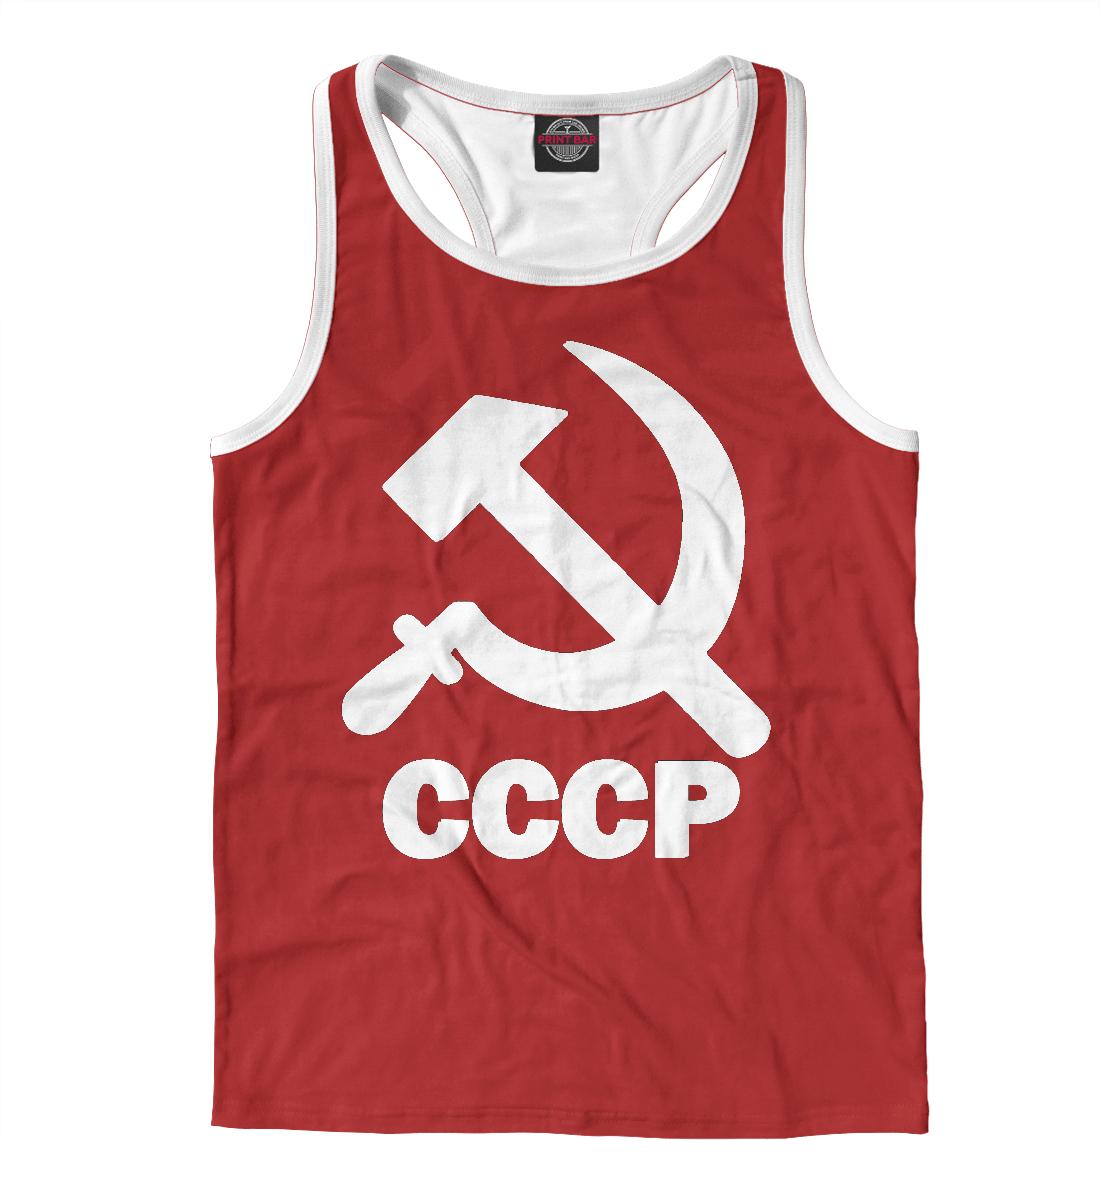 СССР- моя Родина!, Printbar, Майки борцовки, SSS-964163-mayb-2  - купить со скидкой